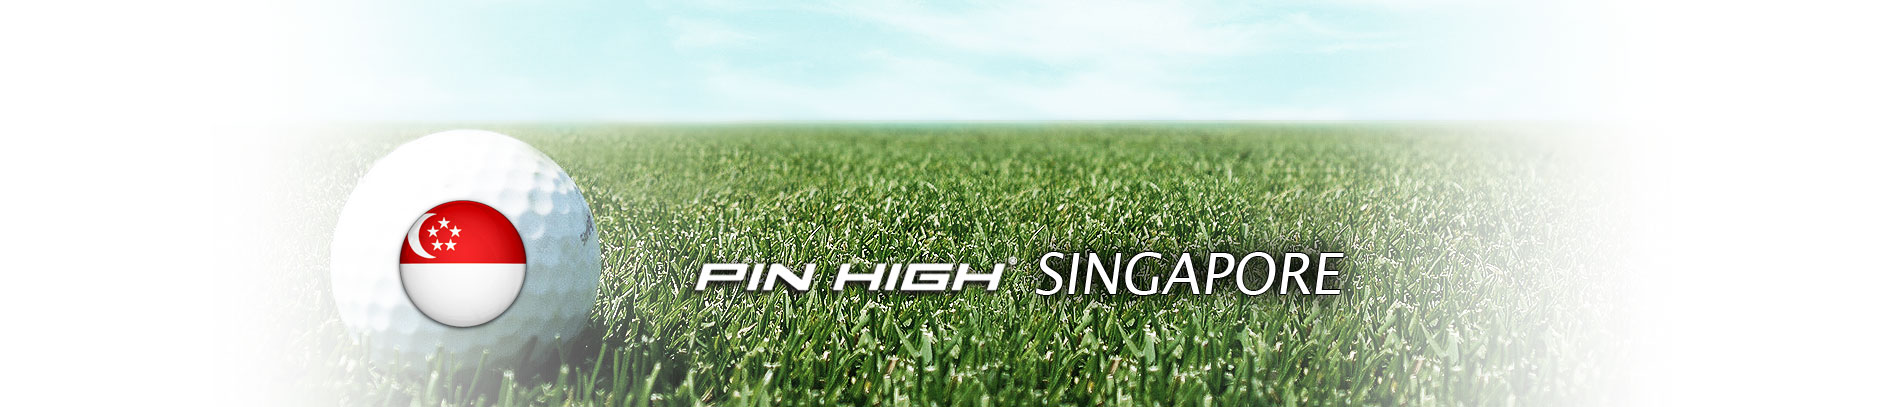 PIN HIGH SINGAPORE